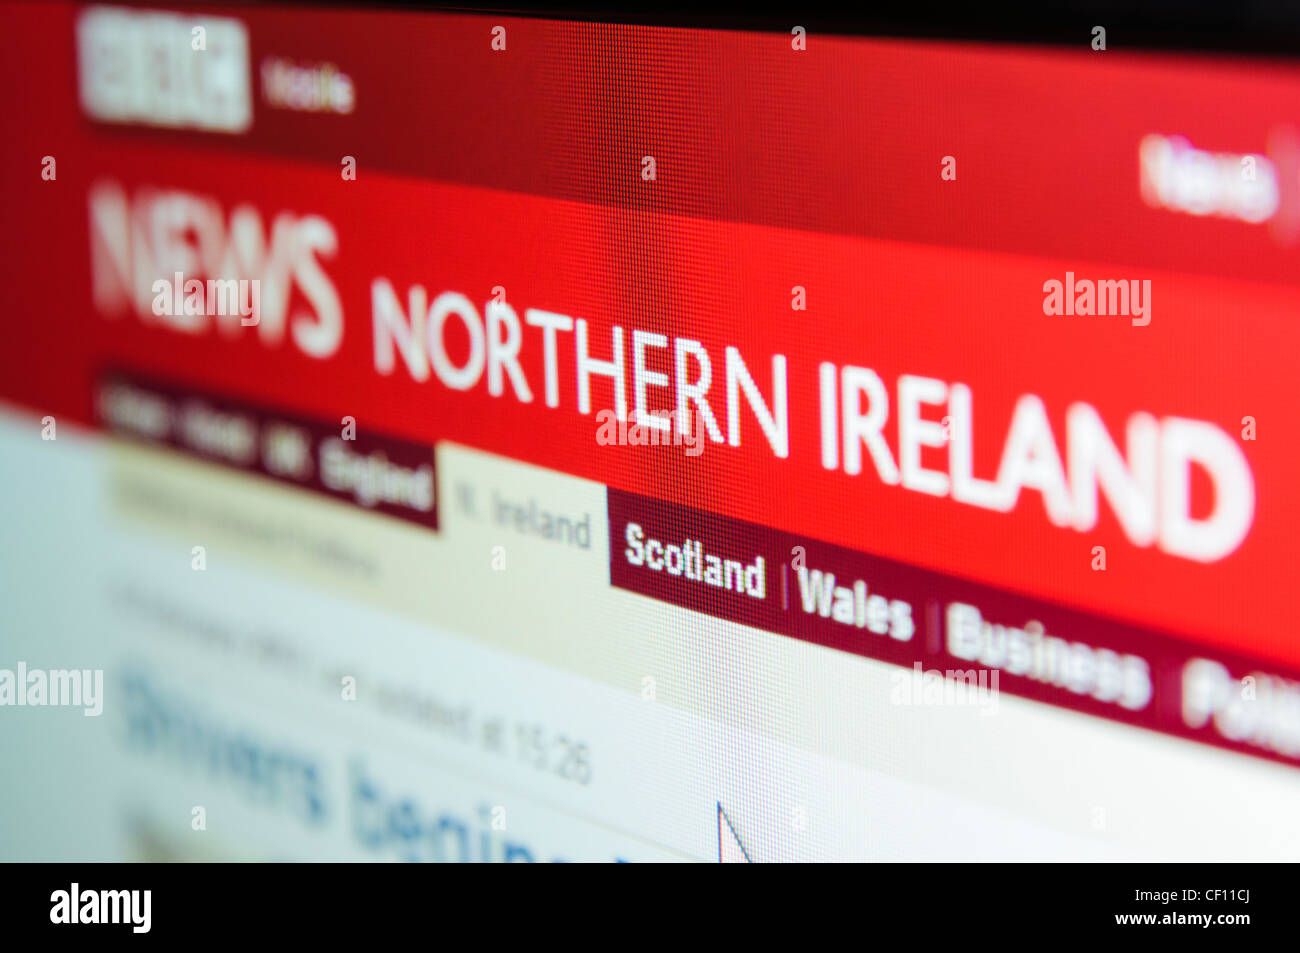 BBC Northern Ireland news page - Stock Image